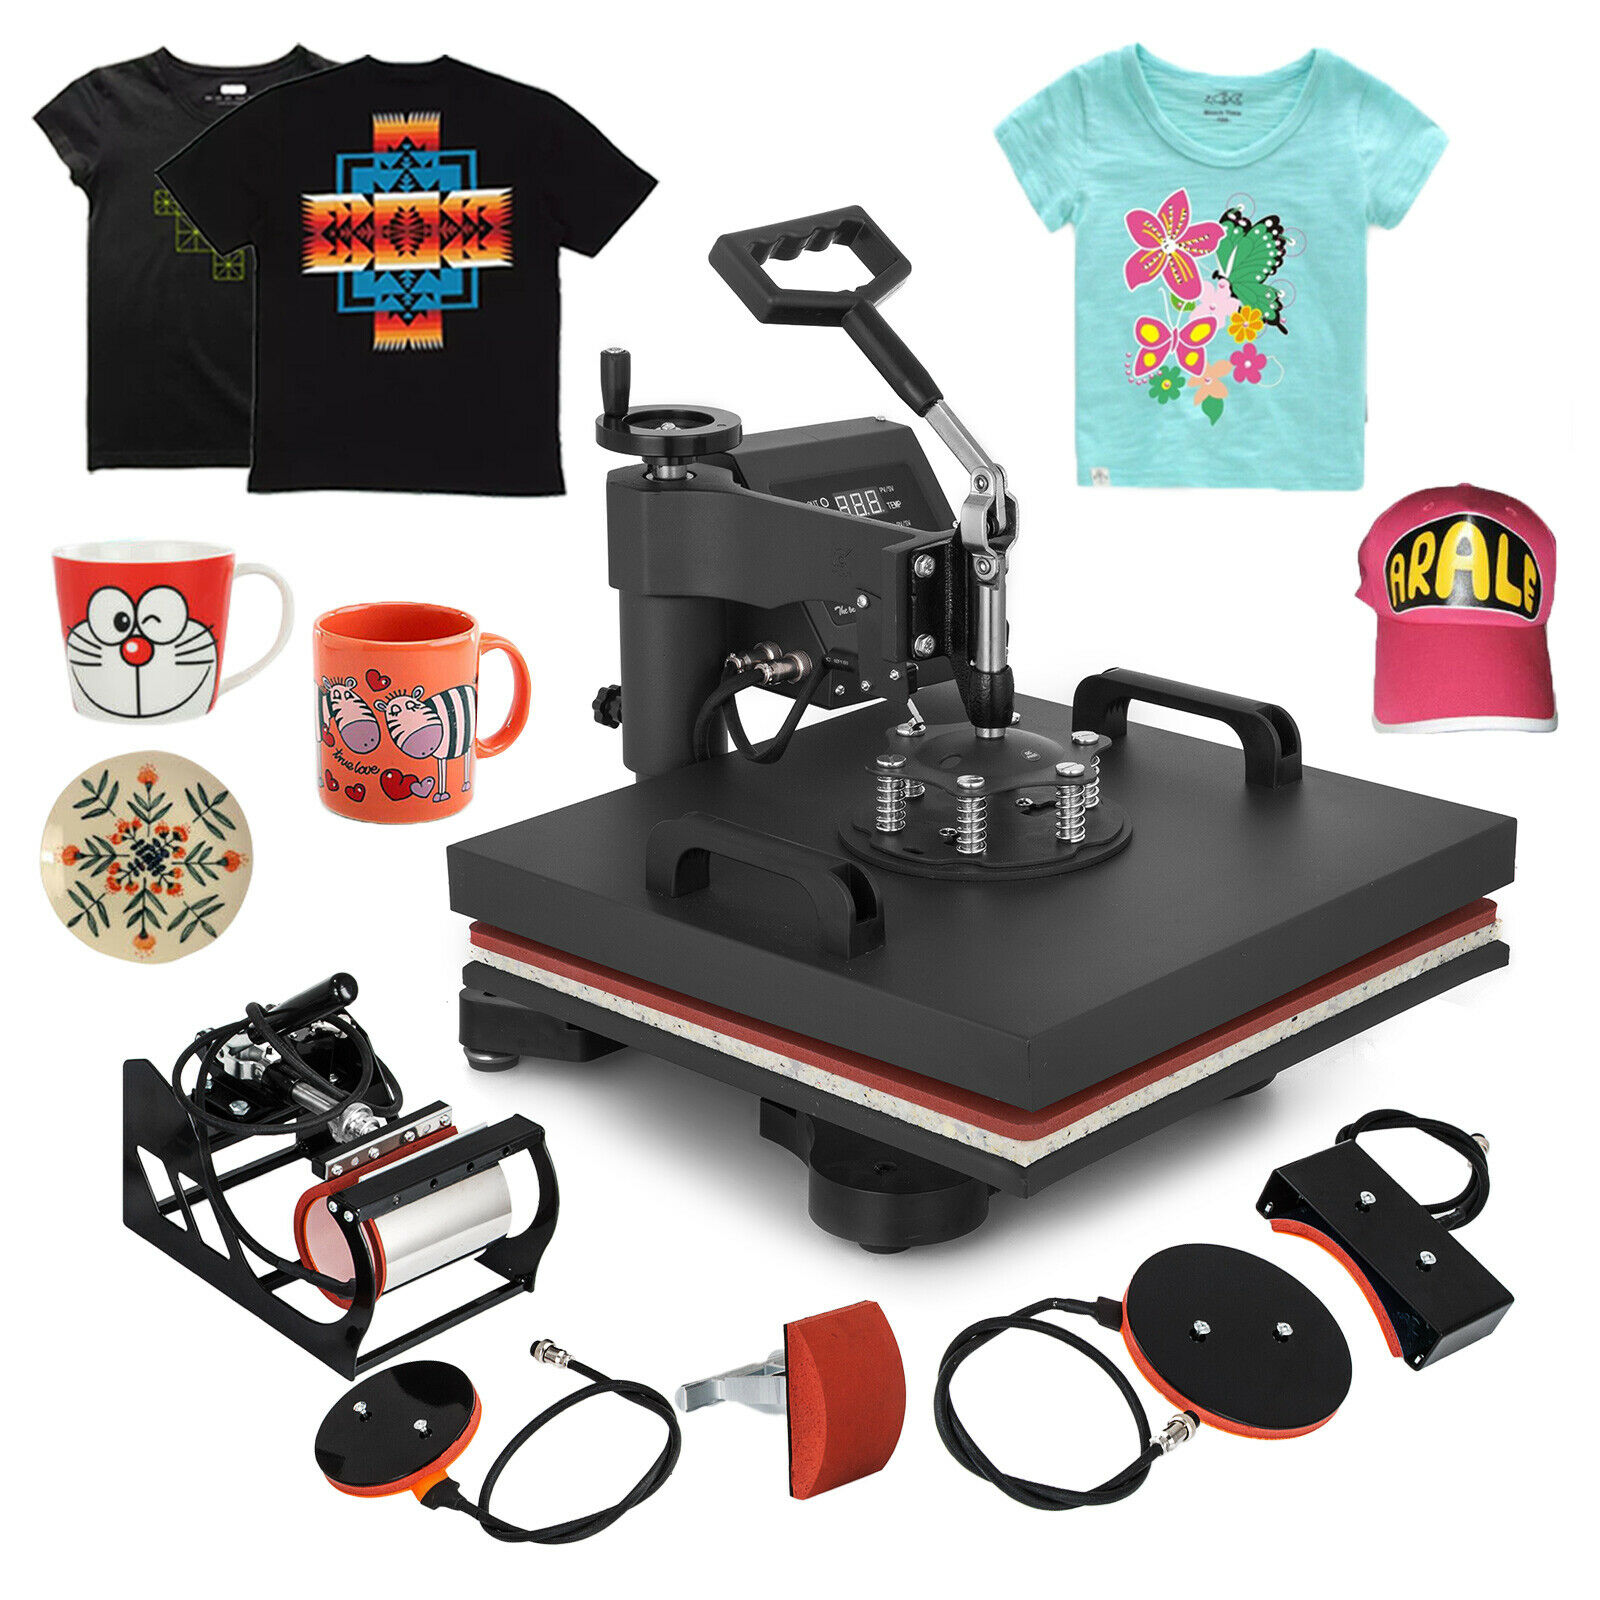 Prensa de calor de 15 pulgadas x 15 pulgadas, máquina de camisetas Combo 5 en 1, impresora Digital DIY Clamshell